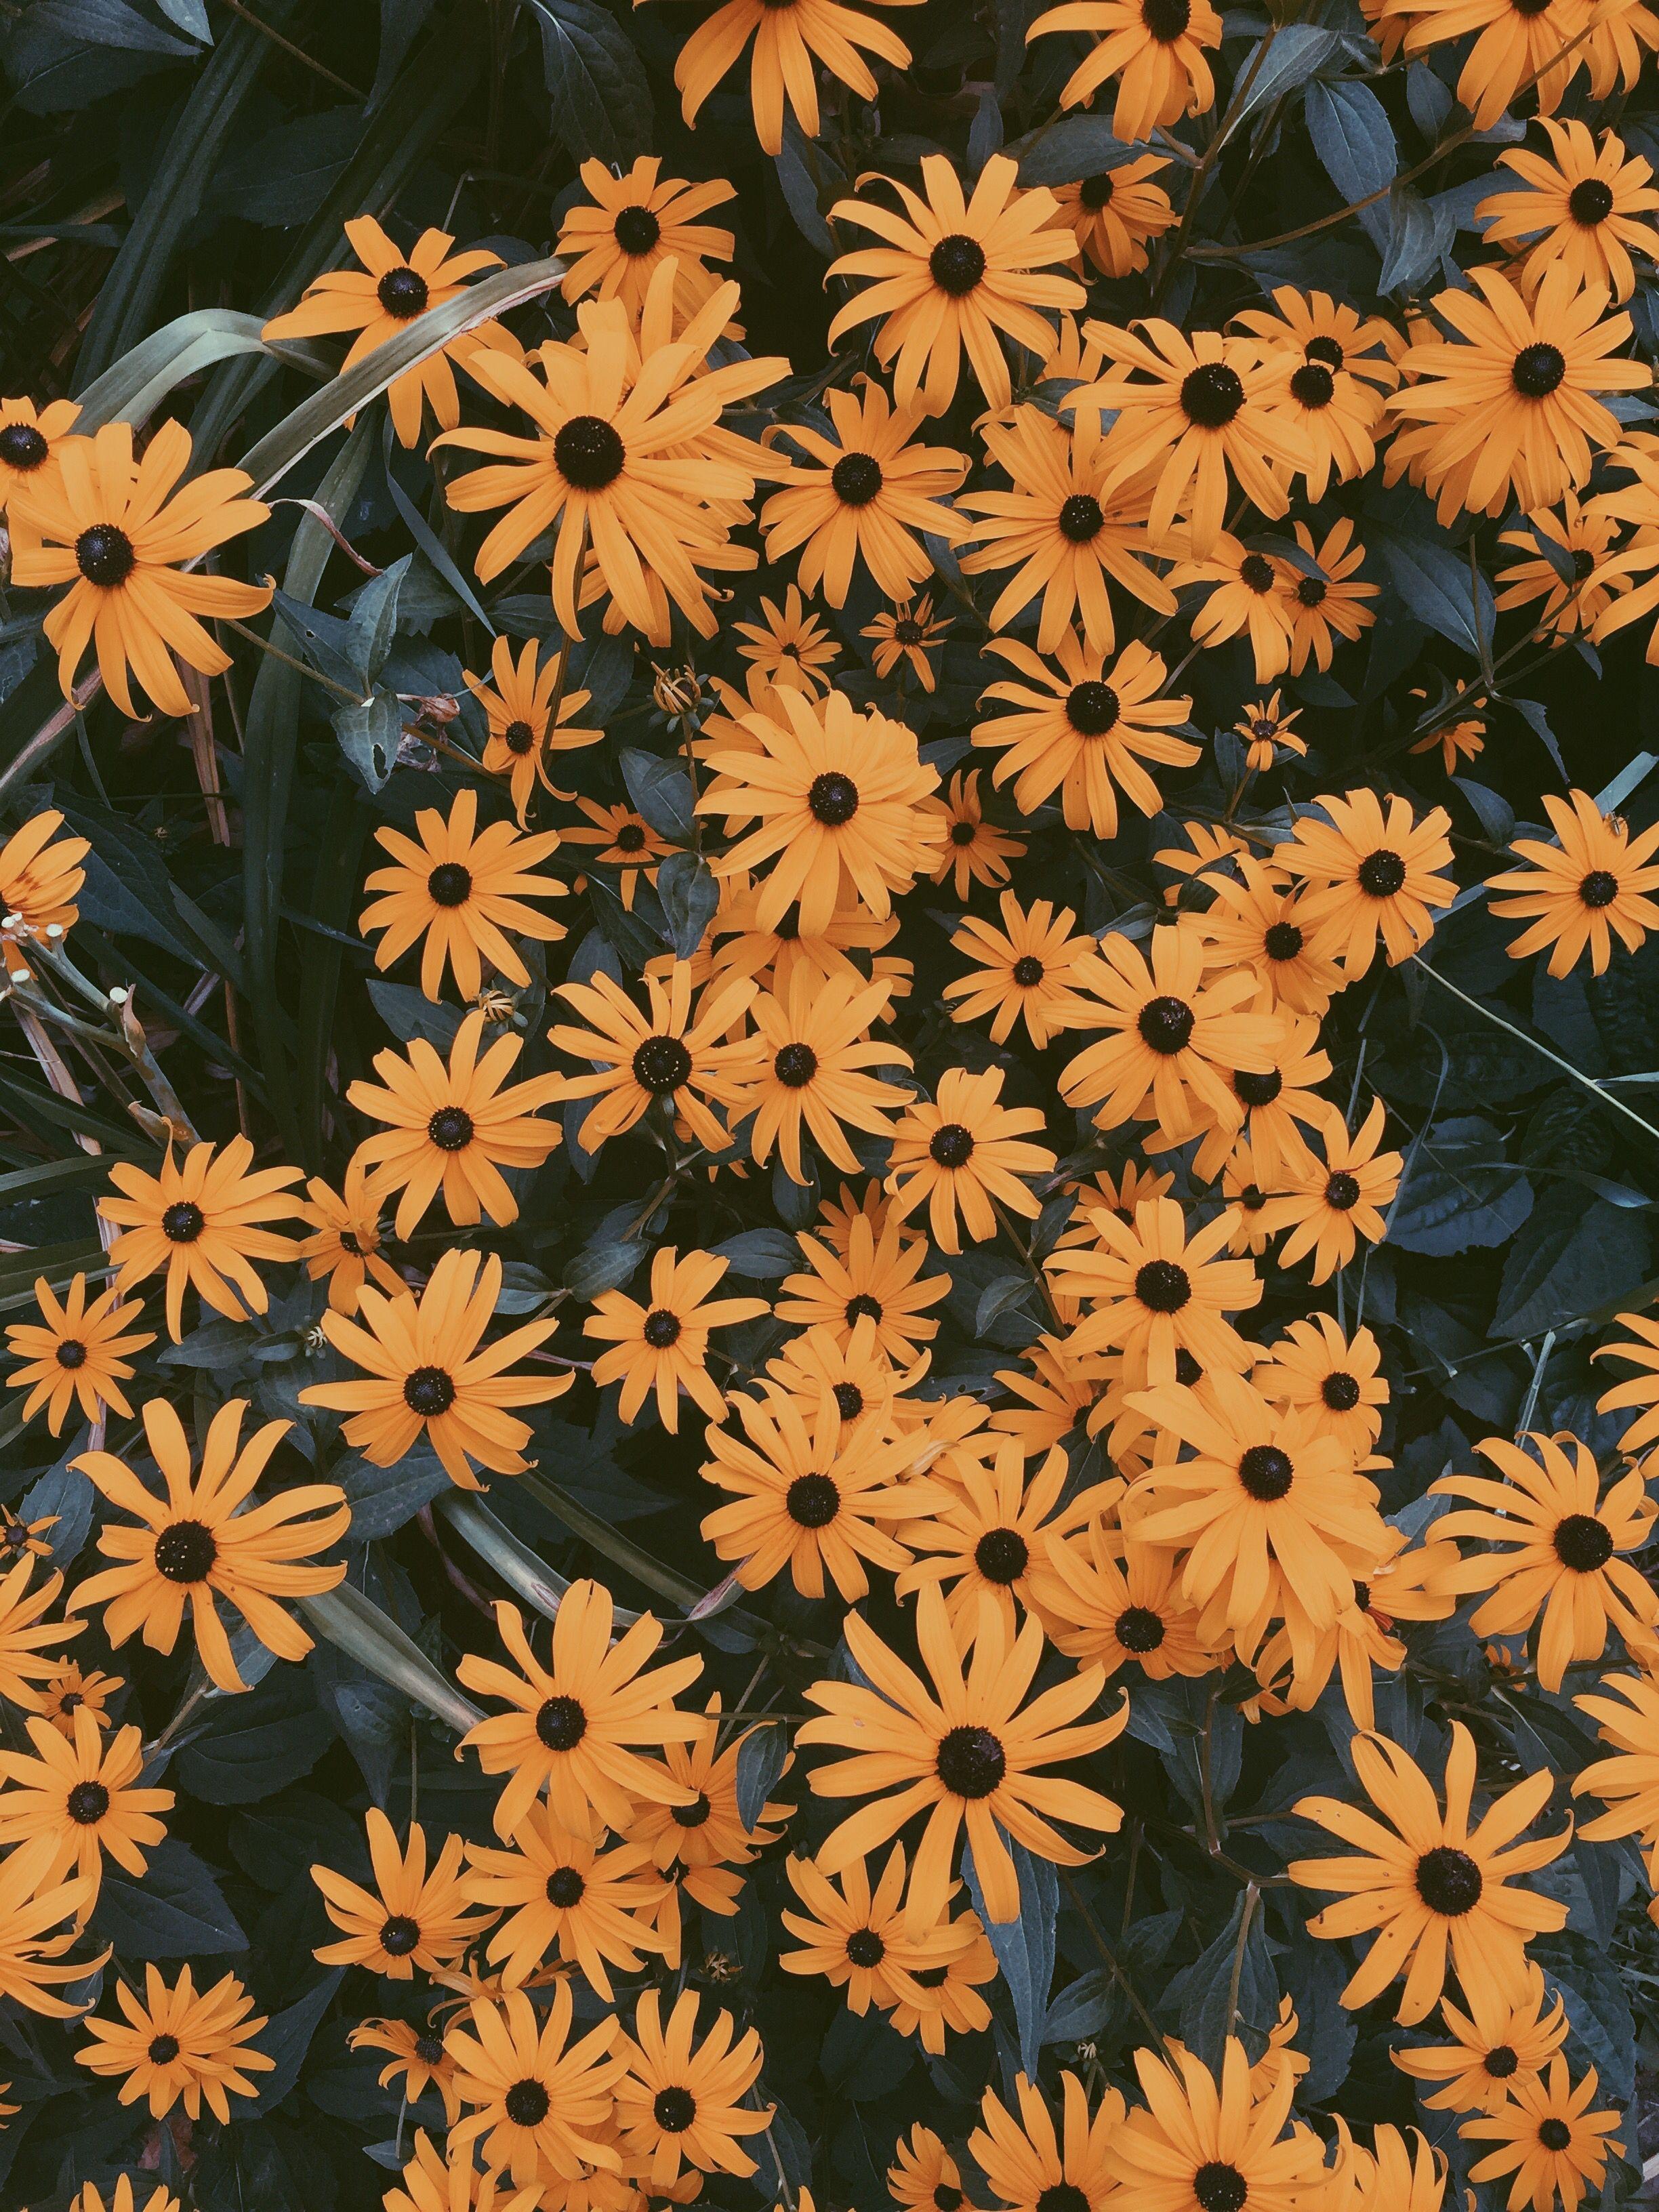 Happiness collage laptop wallpaper oliverandshae 5 out of 5 stars (191) $ 2. pinterest// @joyful_grace | Flower aesthetic, Yellow ...